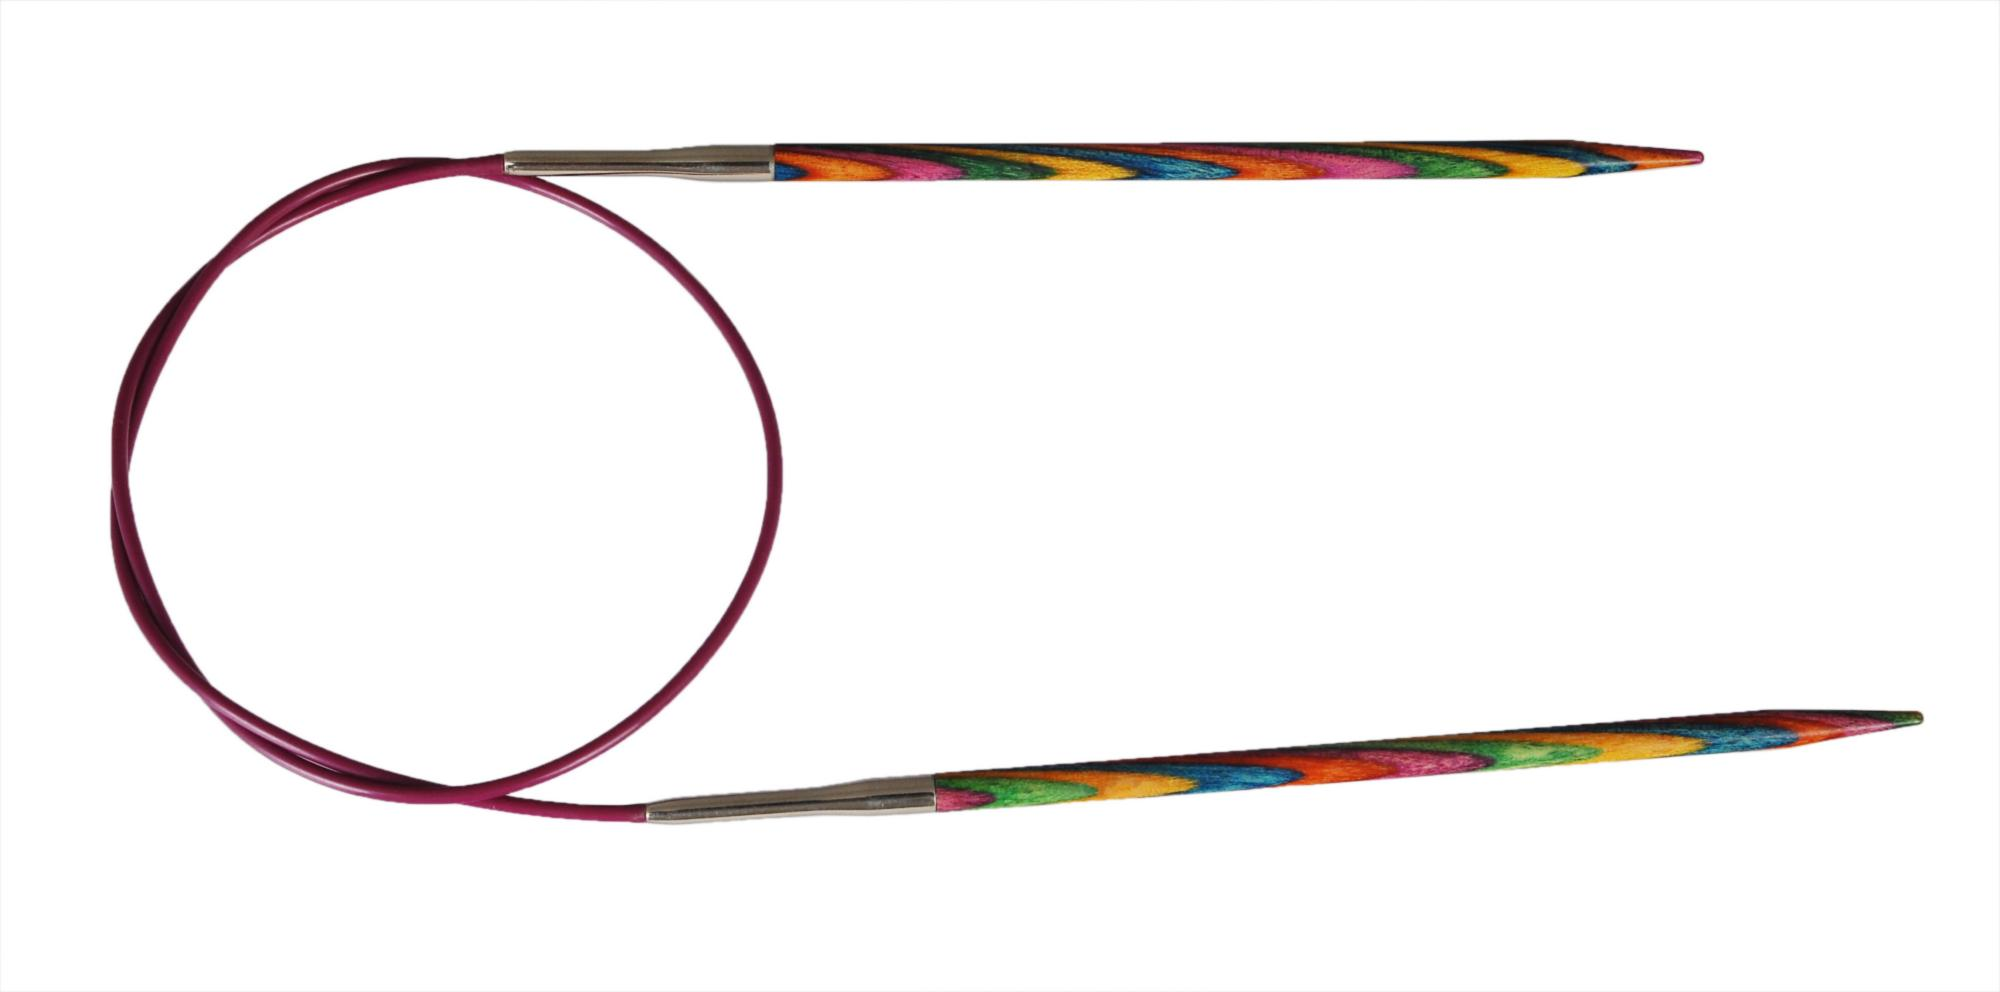 Спицы круговые 120 см Symfonie Wood KnitPro, 21370, 5.50 мм